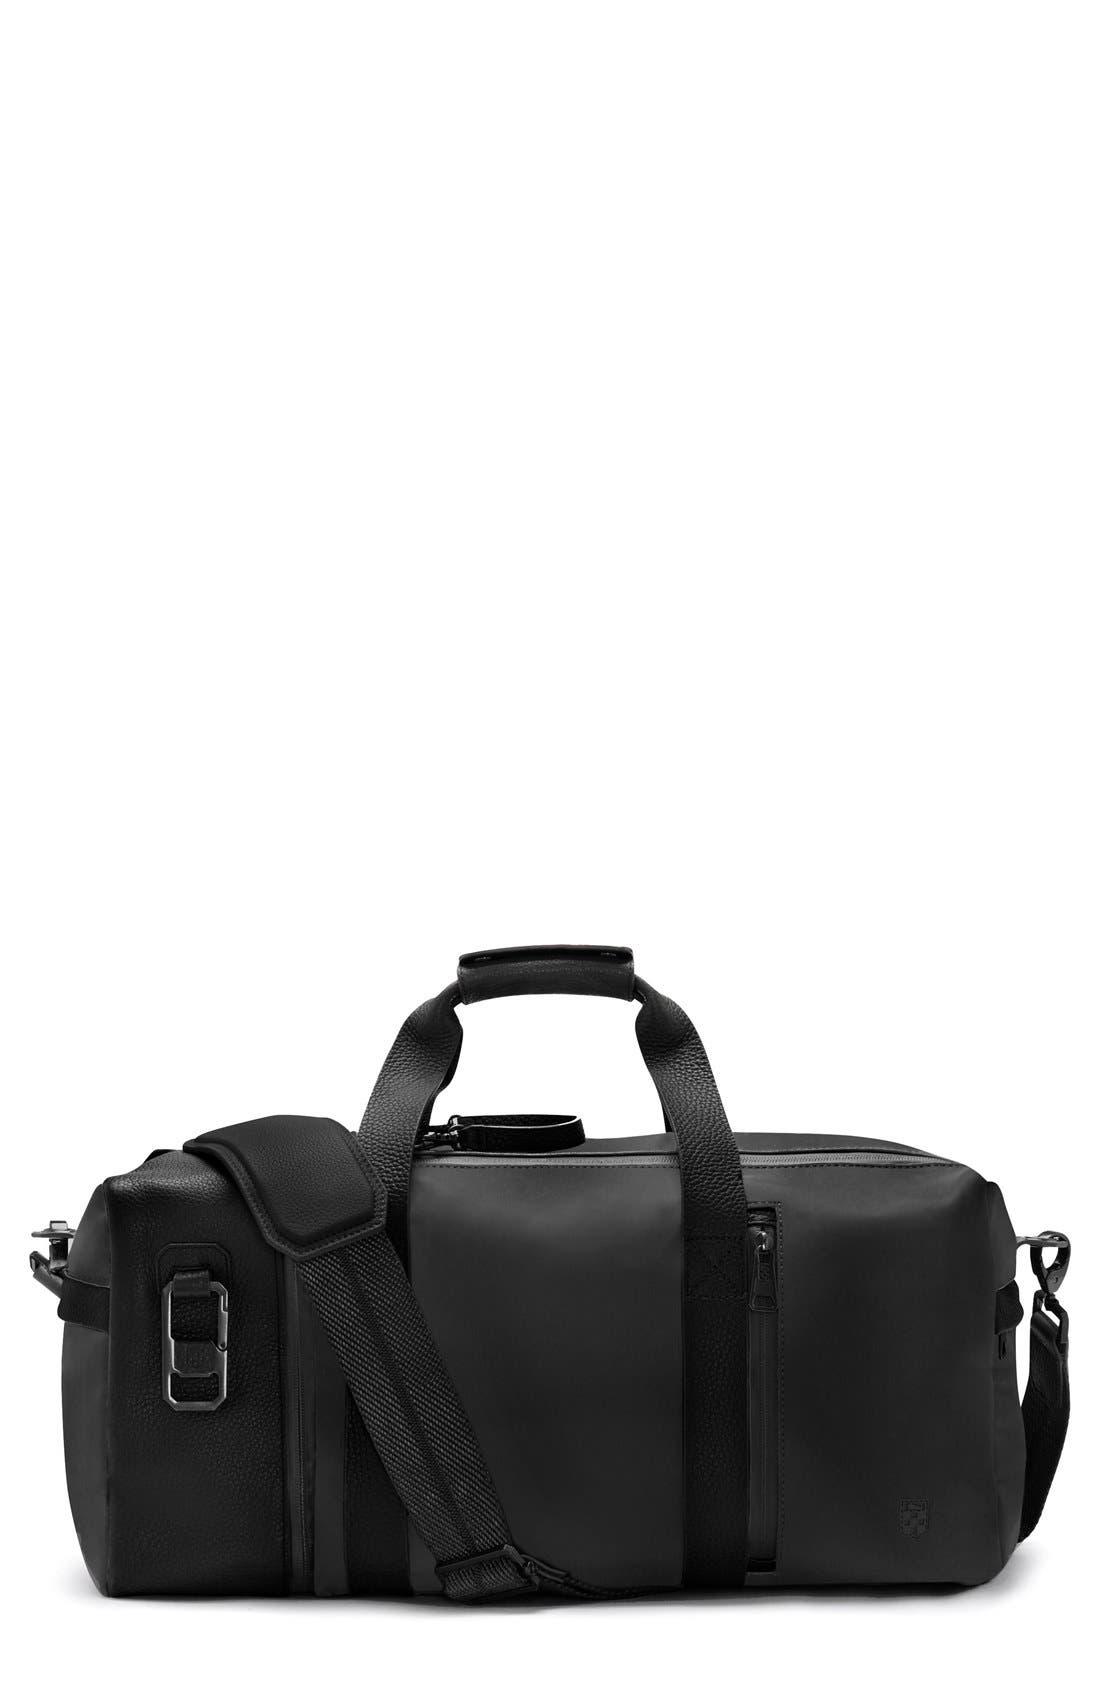 Alternate Image 1 Selected - Vince Camuto 'Mestr' Duffel Bag